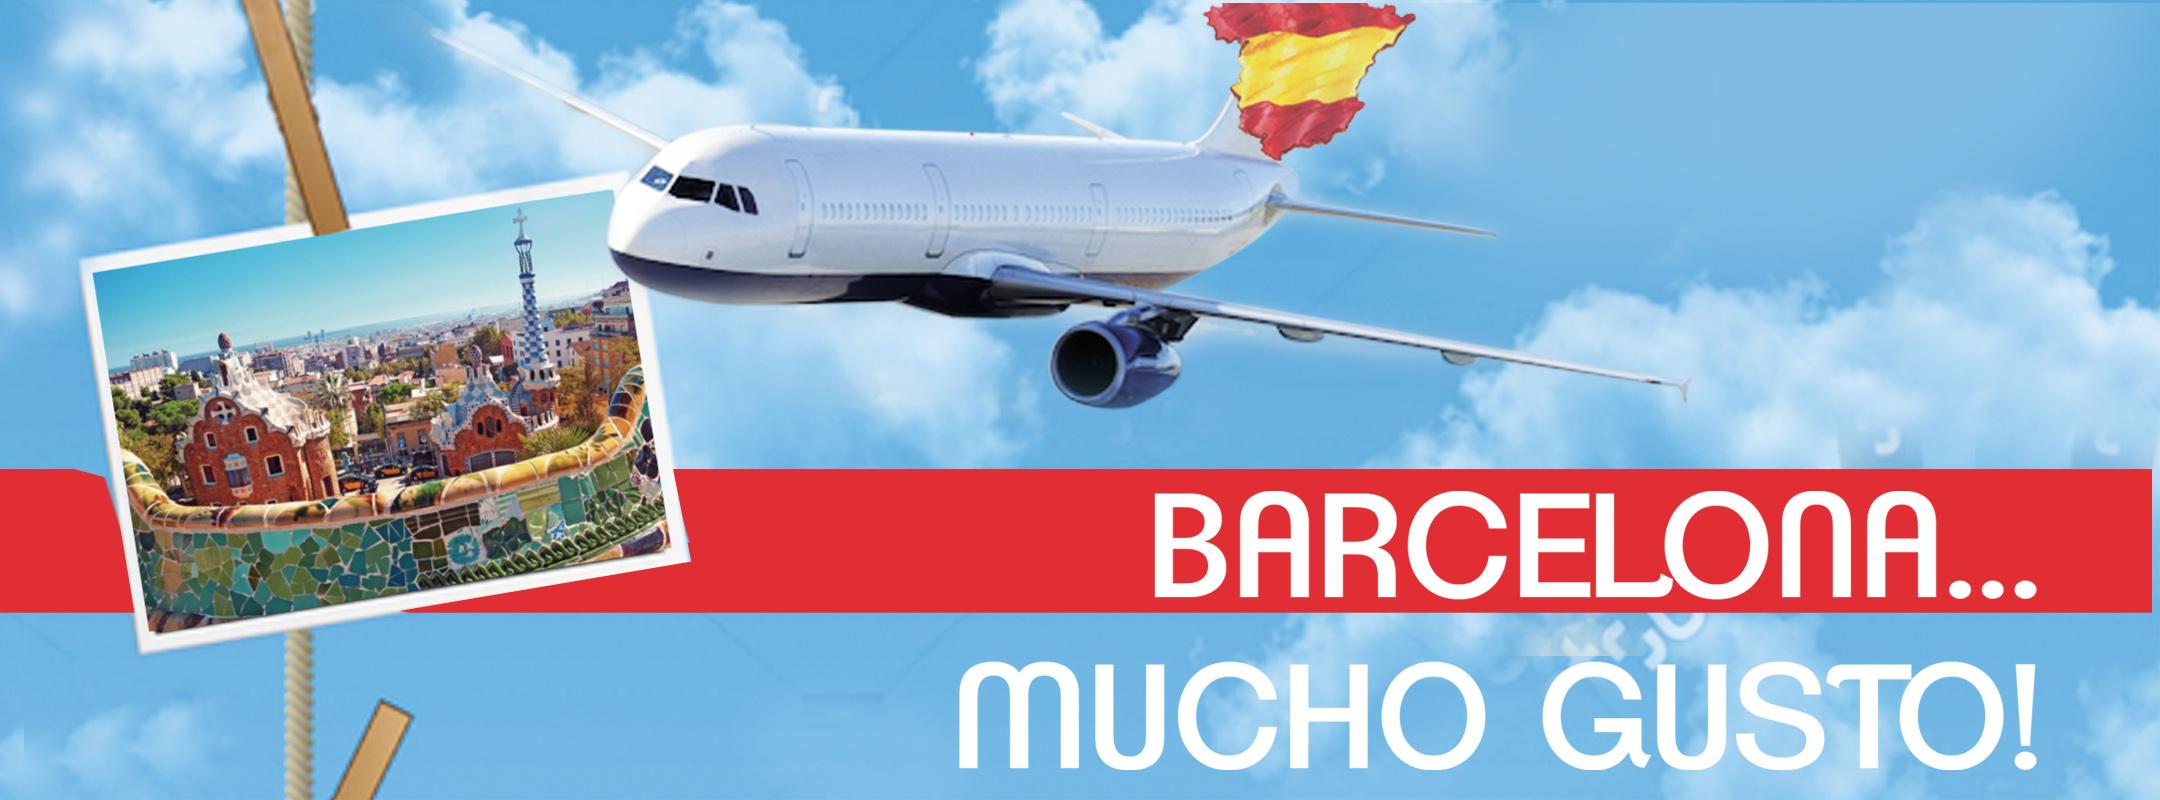 Barcelona…Mucho Gusto!